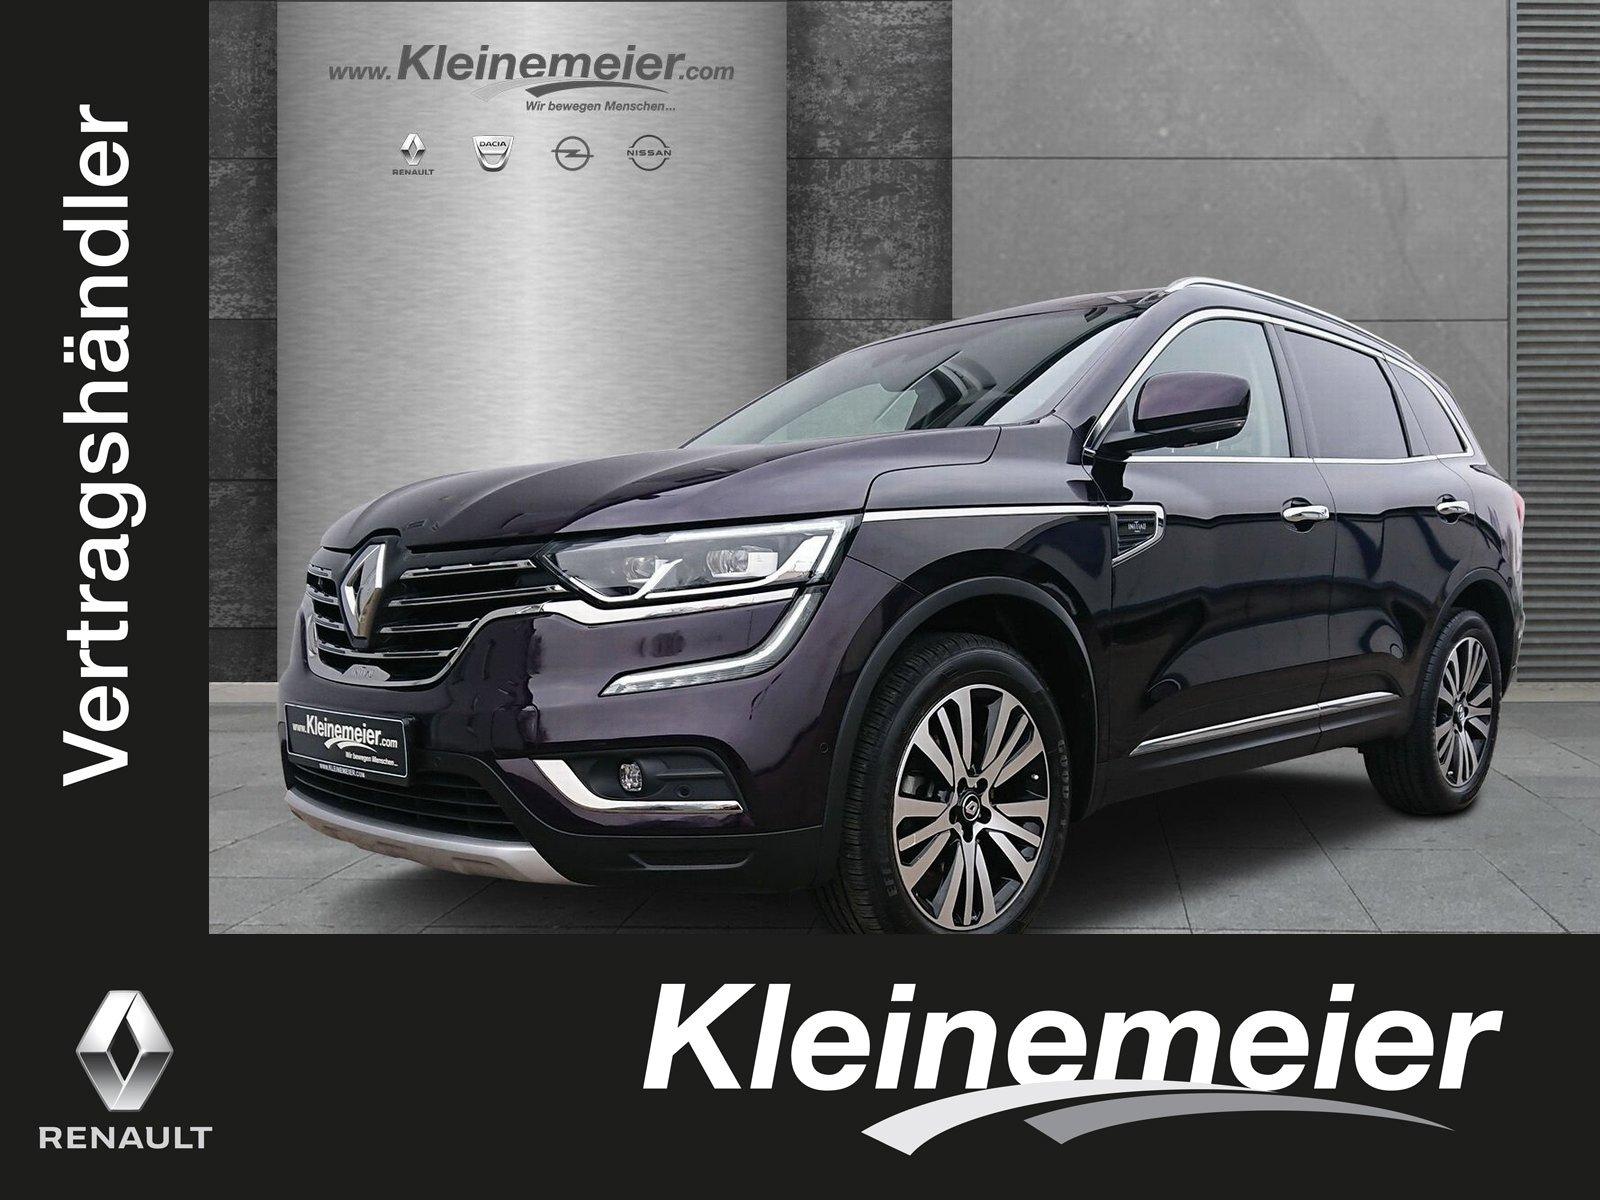 Renault Koleos 2.0 dCi Initiale Paris 4x4*LED*Leder*RFK*, Jahr 2018, Diesel